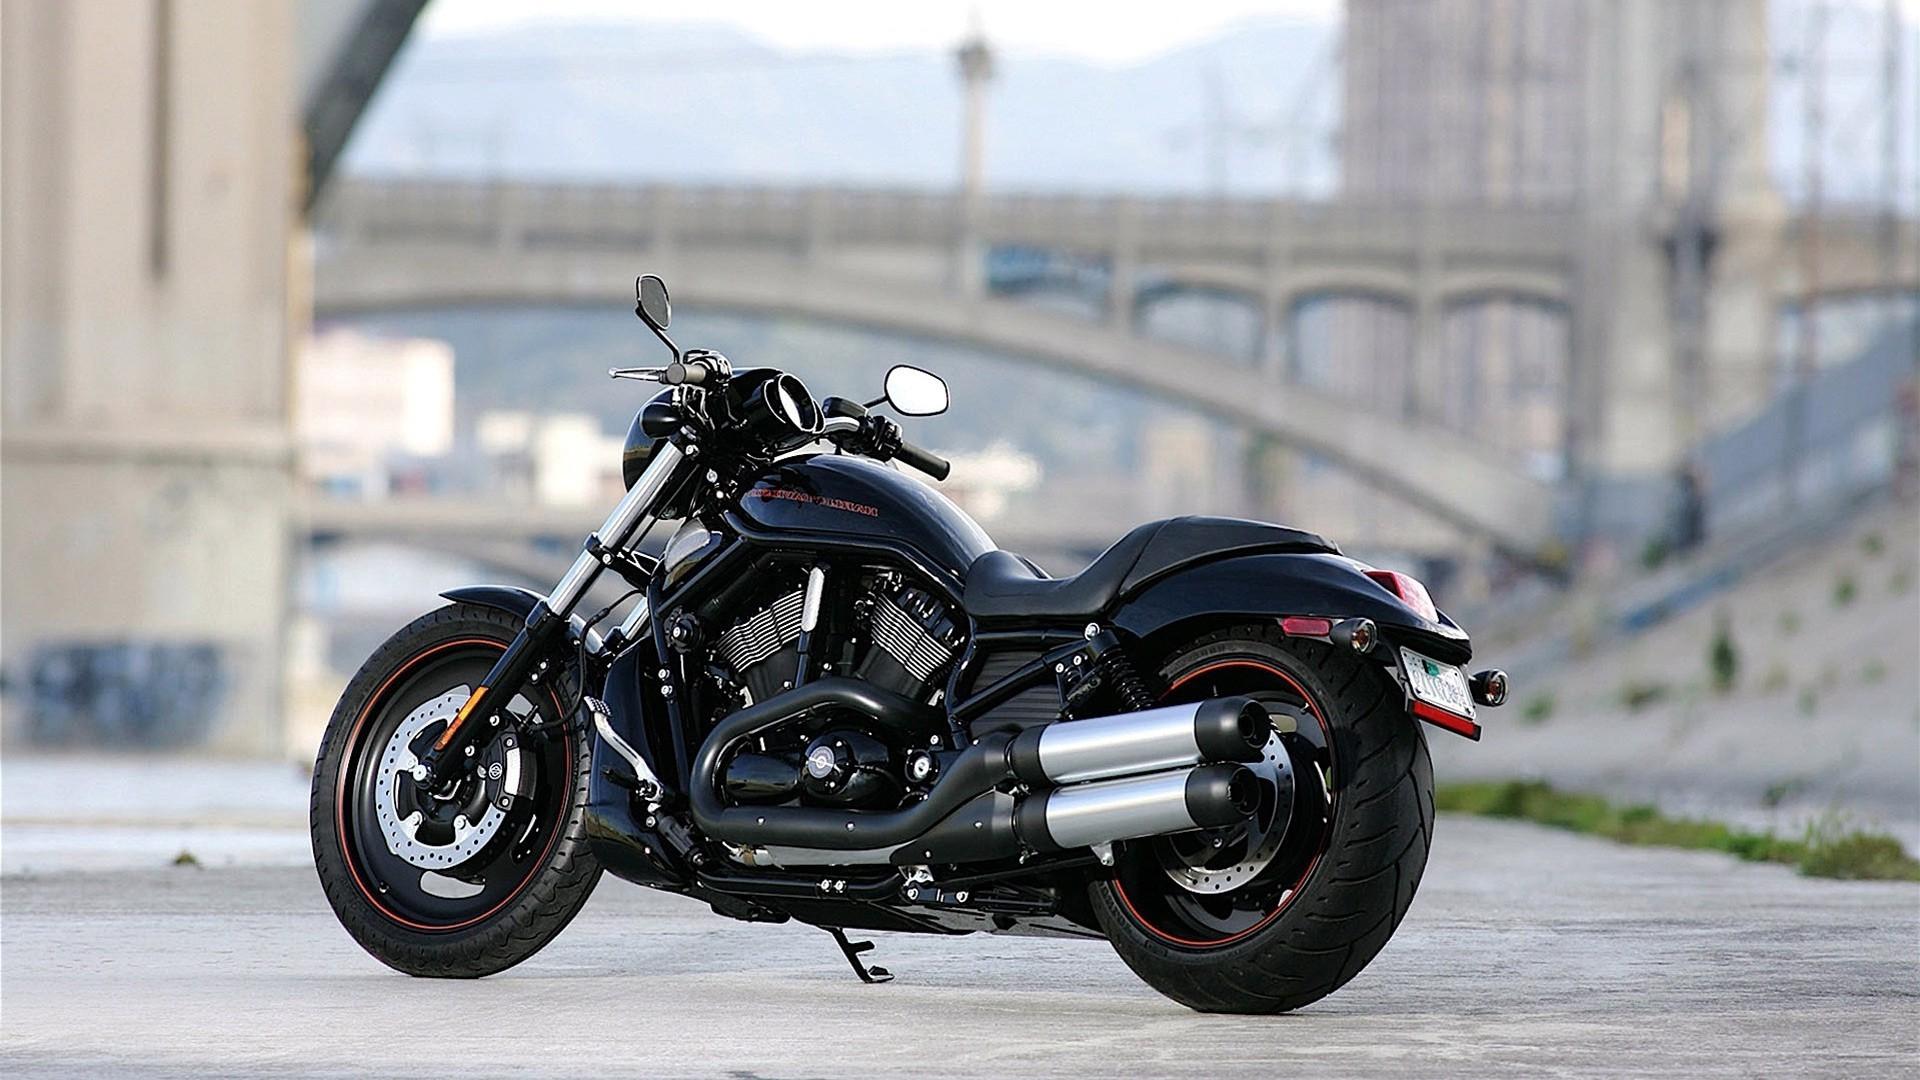 Обои Мотоцикл, Harley davidson, Пейзаж. Мотоциклы foto 12